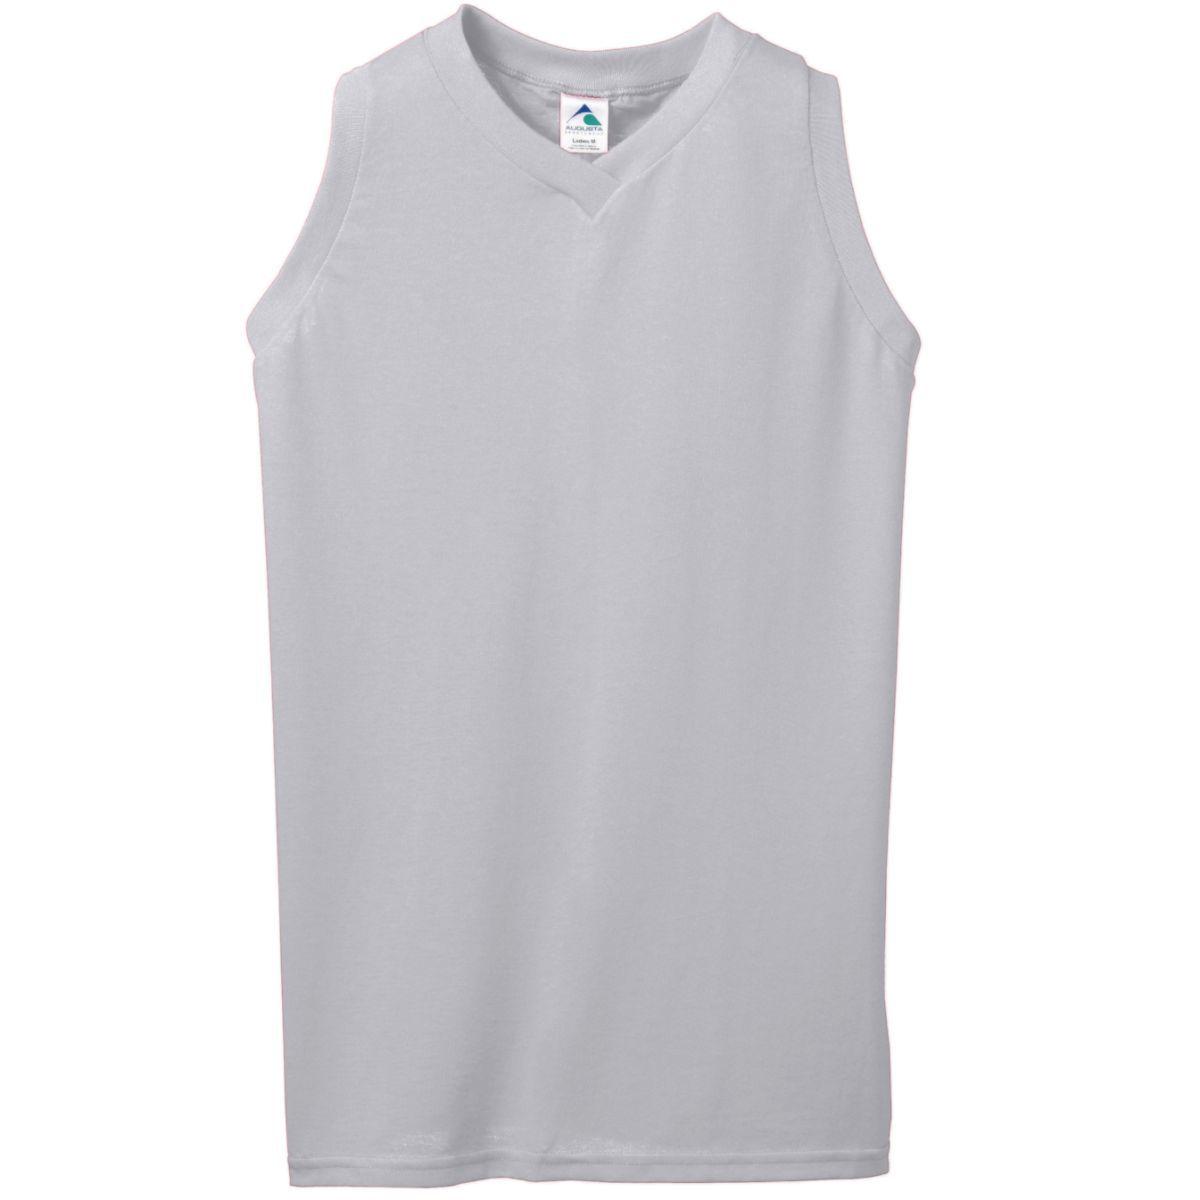 Ladies Sleeveless V-Neck Poly/Cotton Jersey - ATHLETIC HEATHER